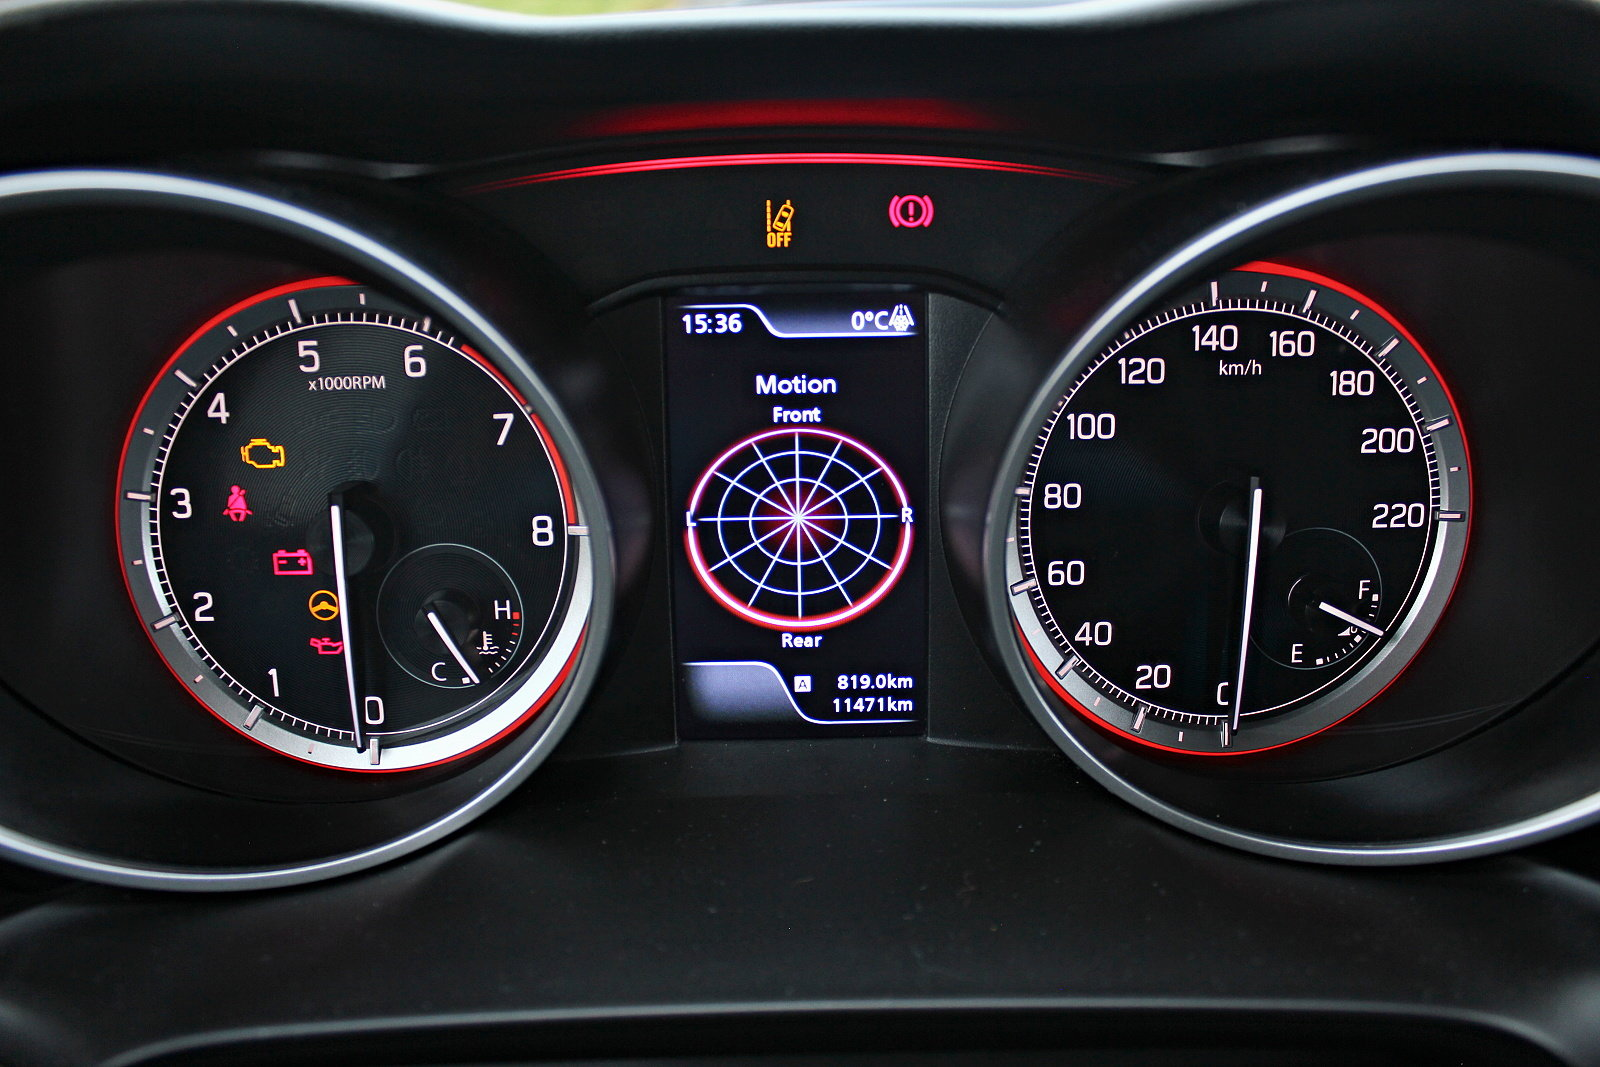 Suzuki Swift 1.0 SHVS